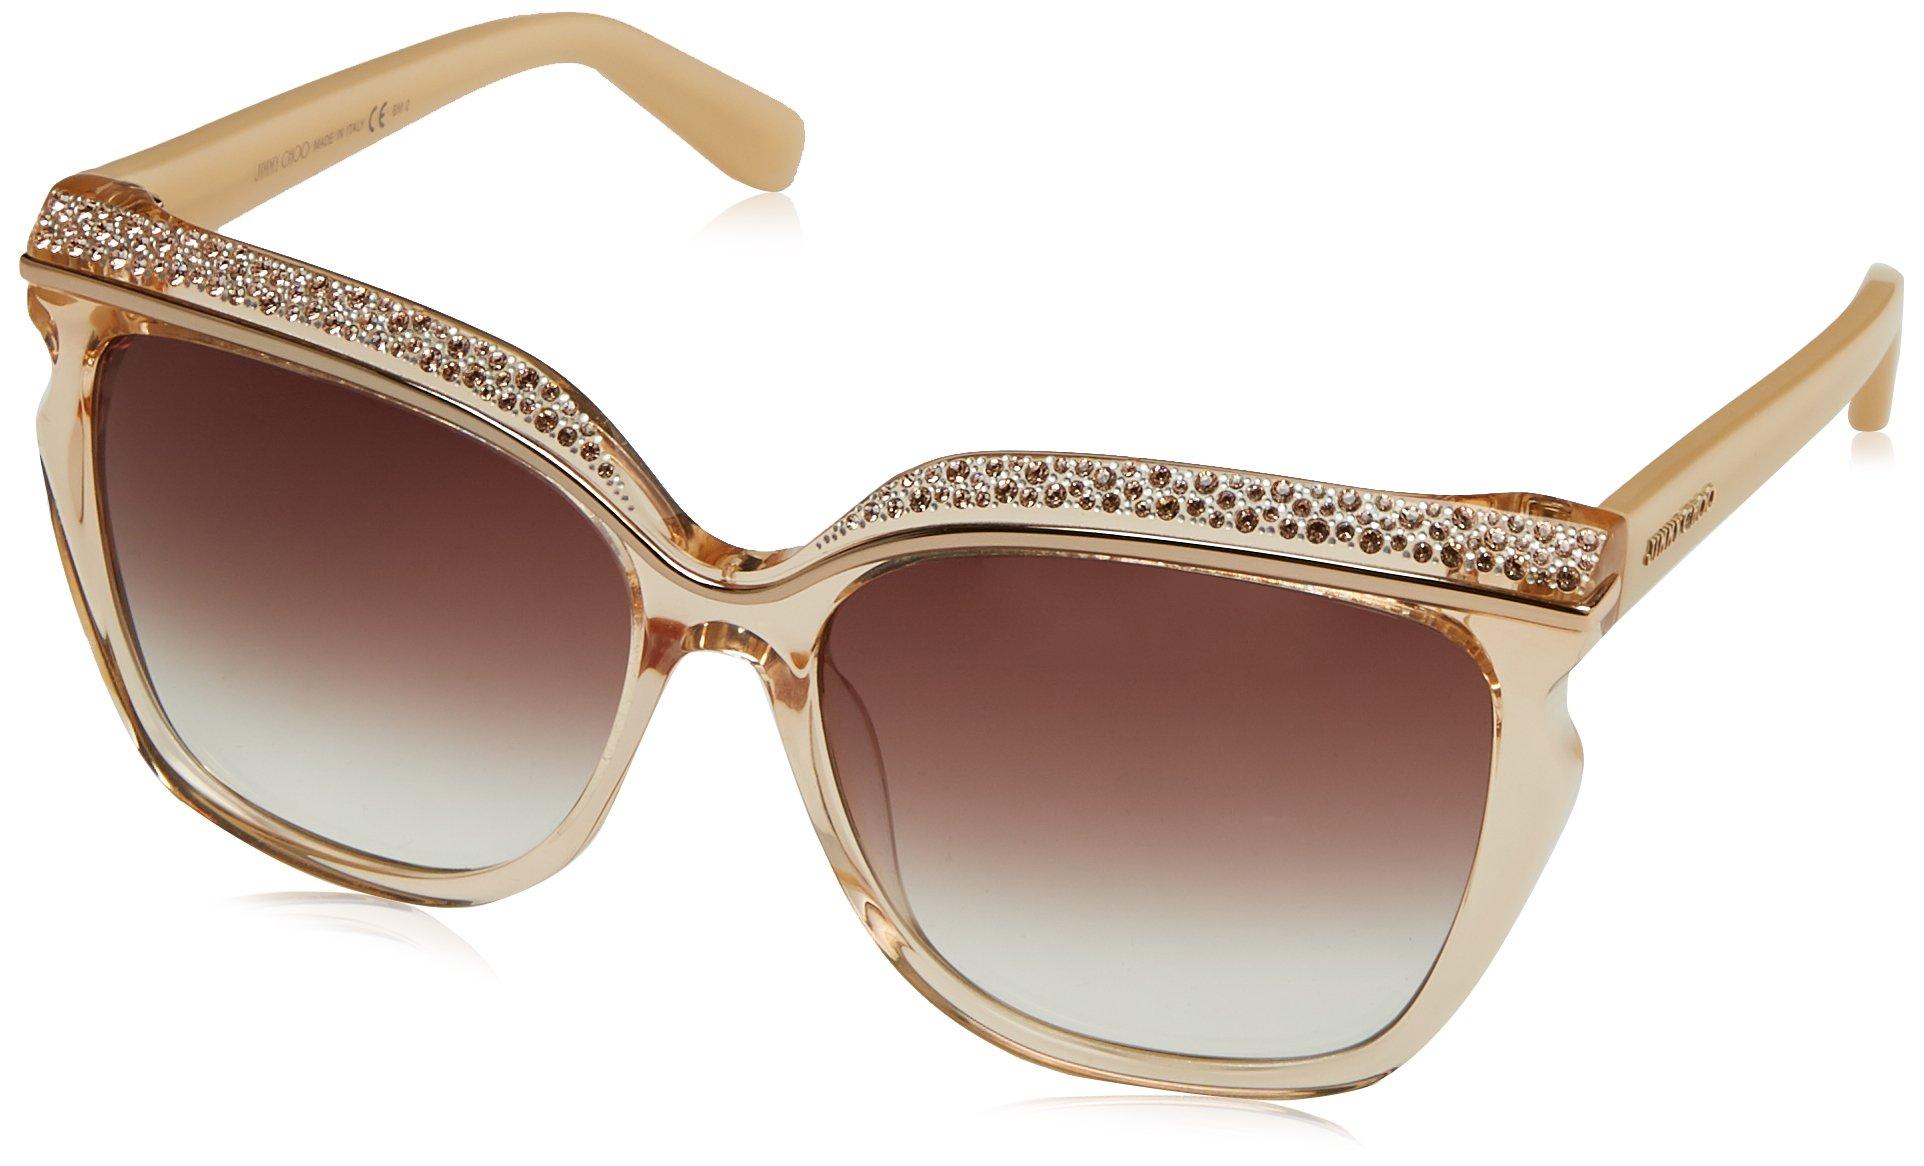 Jimmy Choo Sophia/S DLN FM Nude Beige Sunglasses 58mm